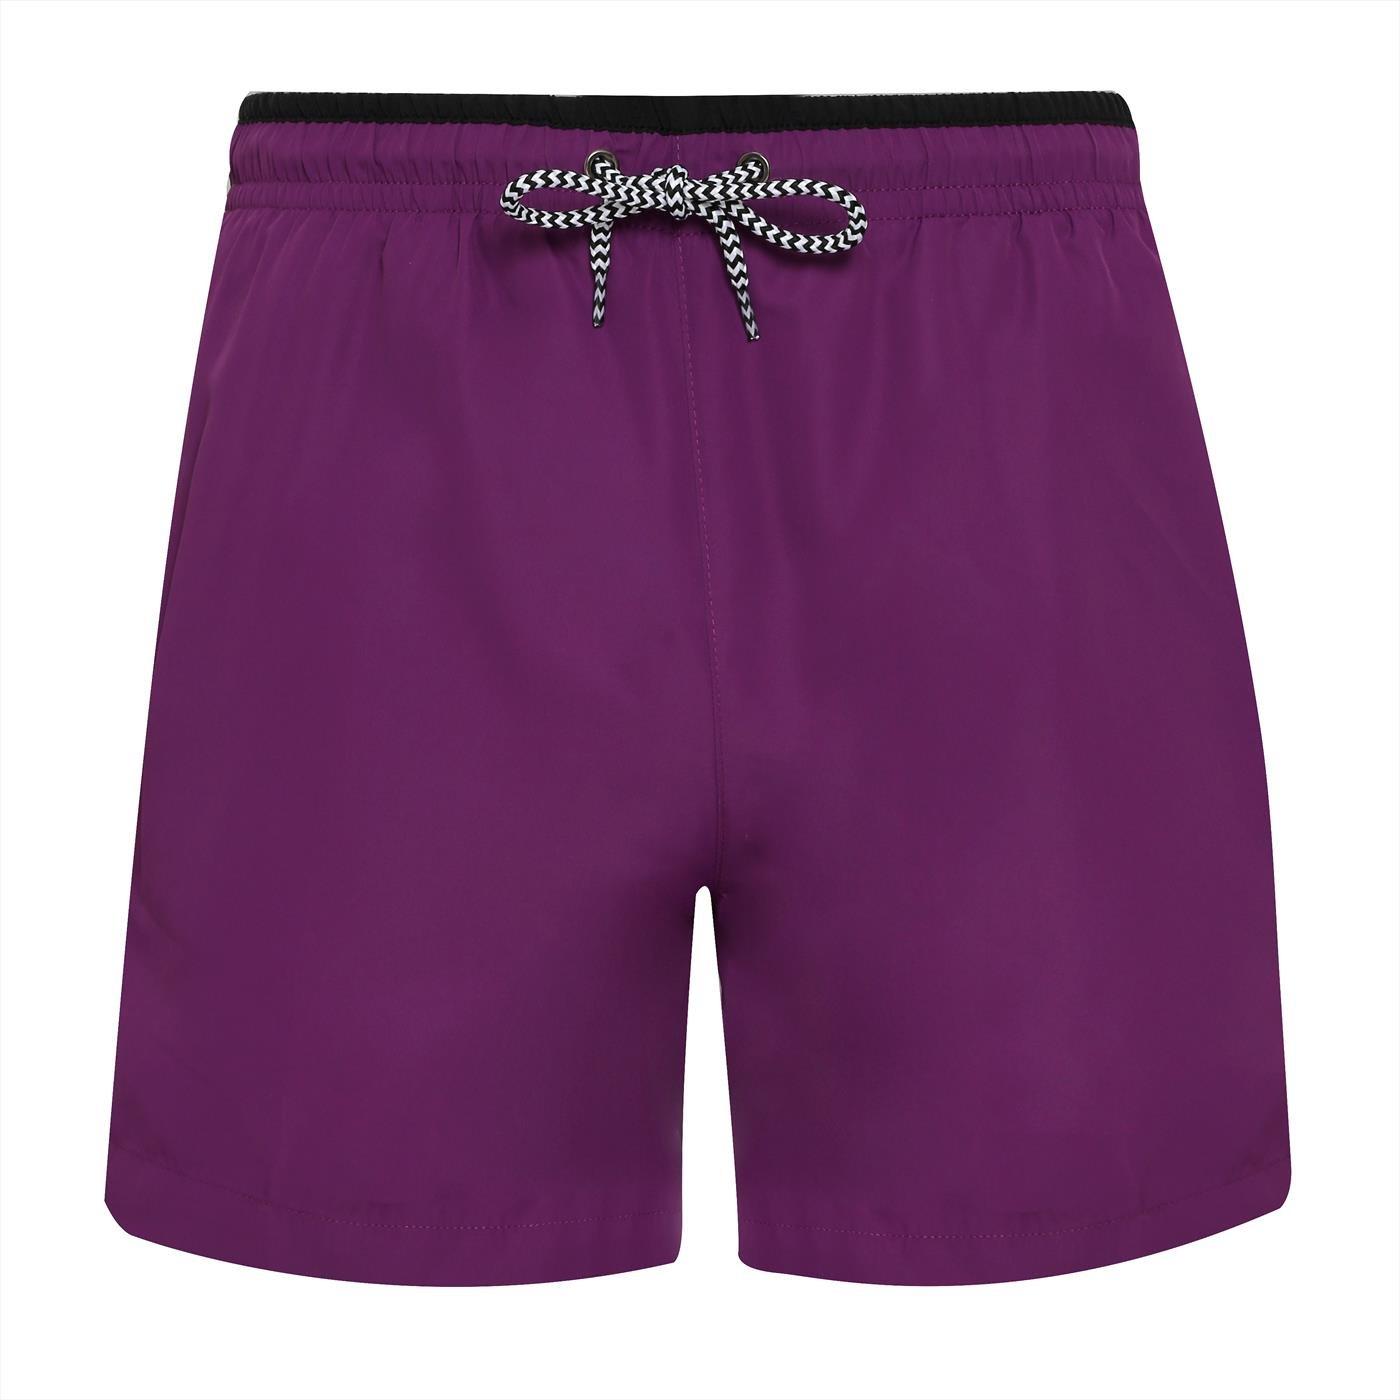 167d881a50dc2 Amazon.com: Asquith Fox Men's swim shorts: Clothing